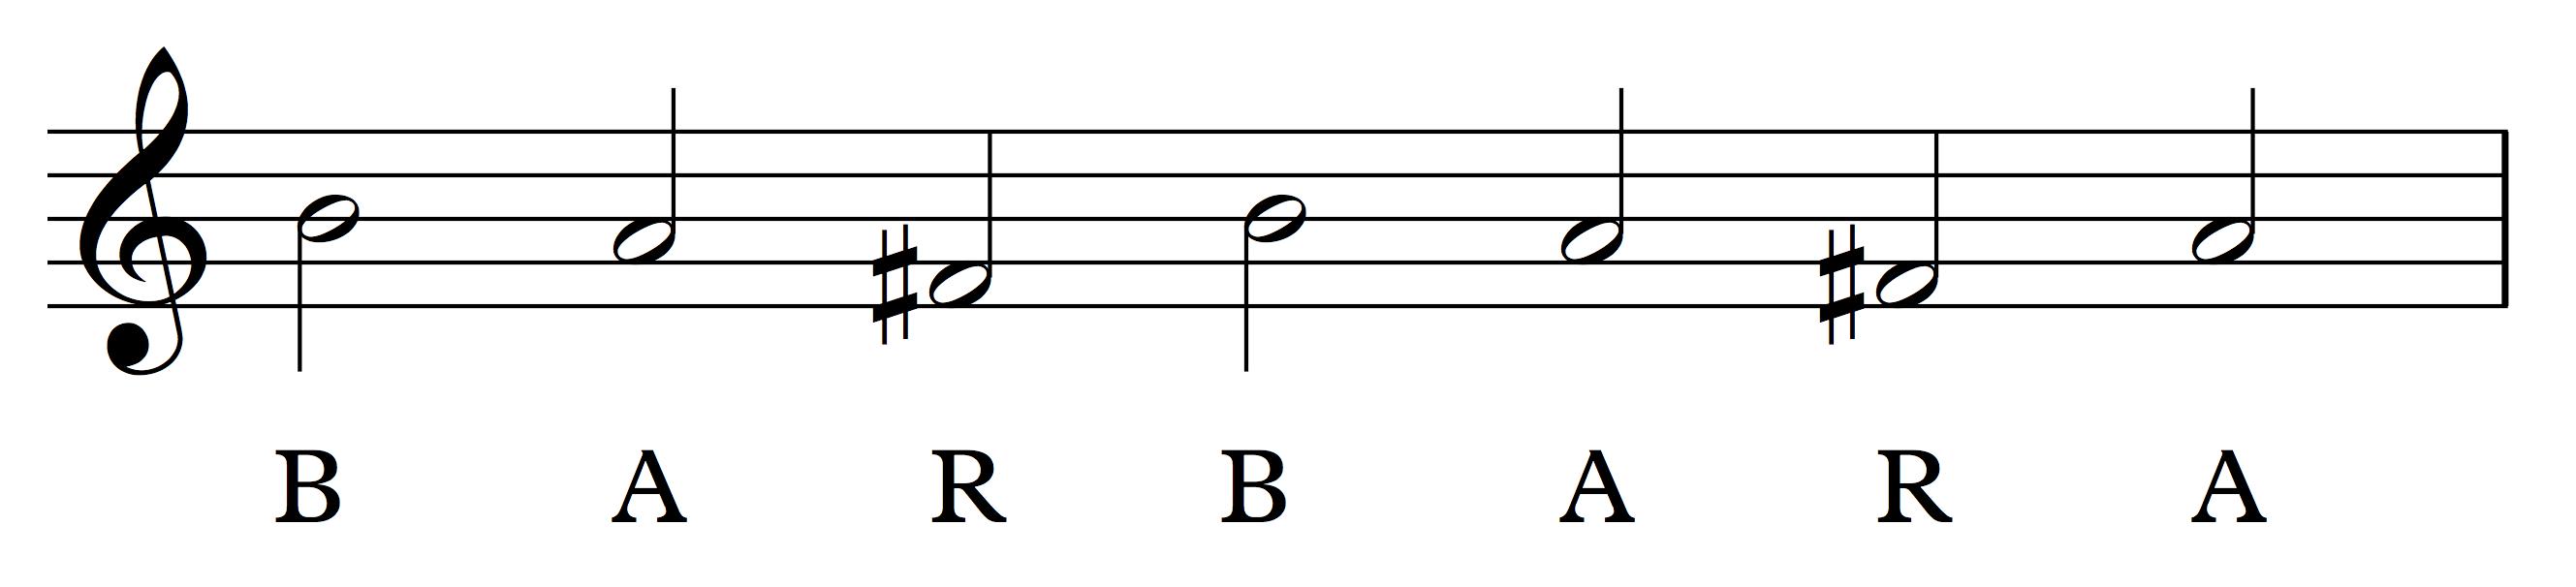 Barbara motif for School of Composition.com Challenge